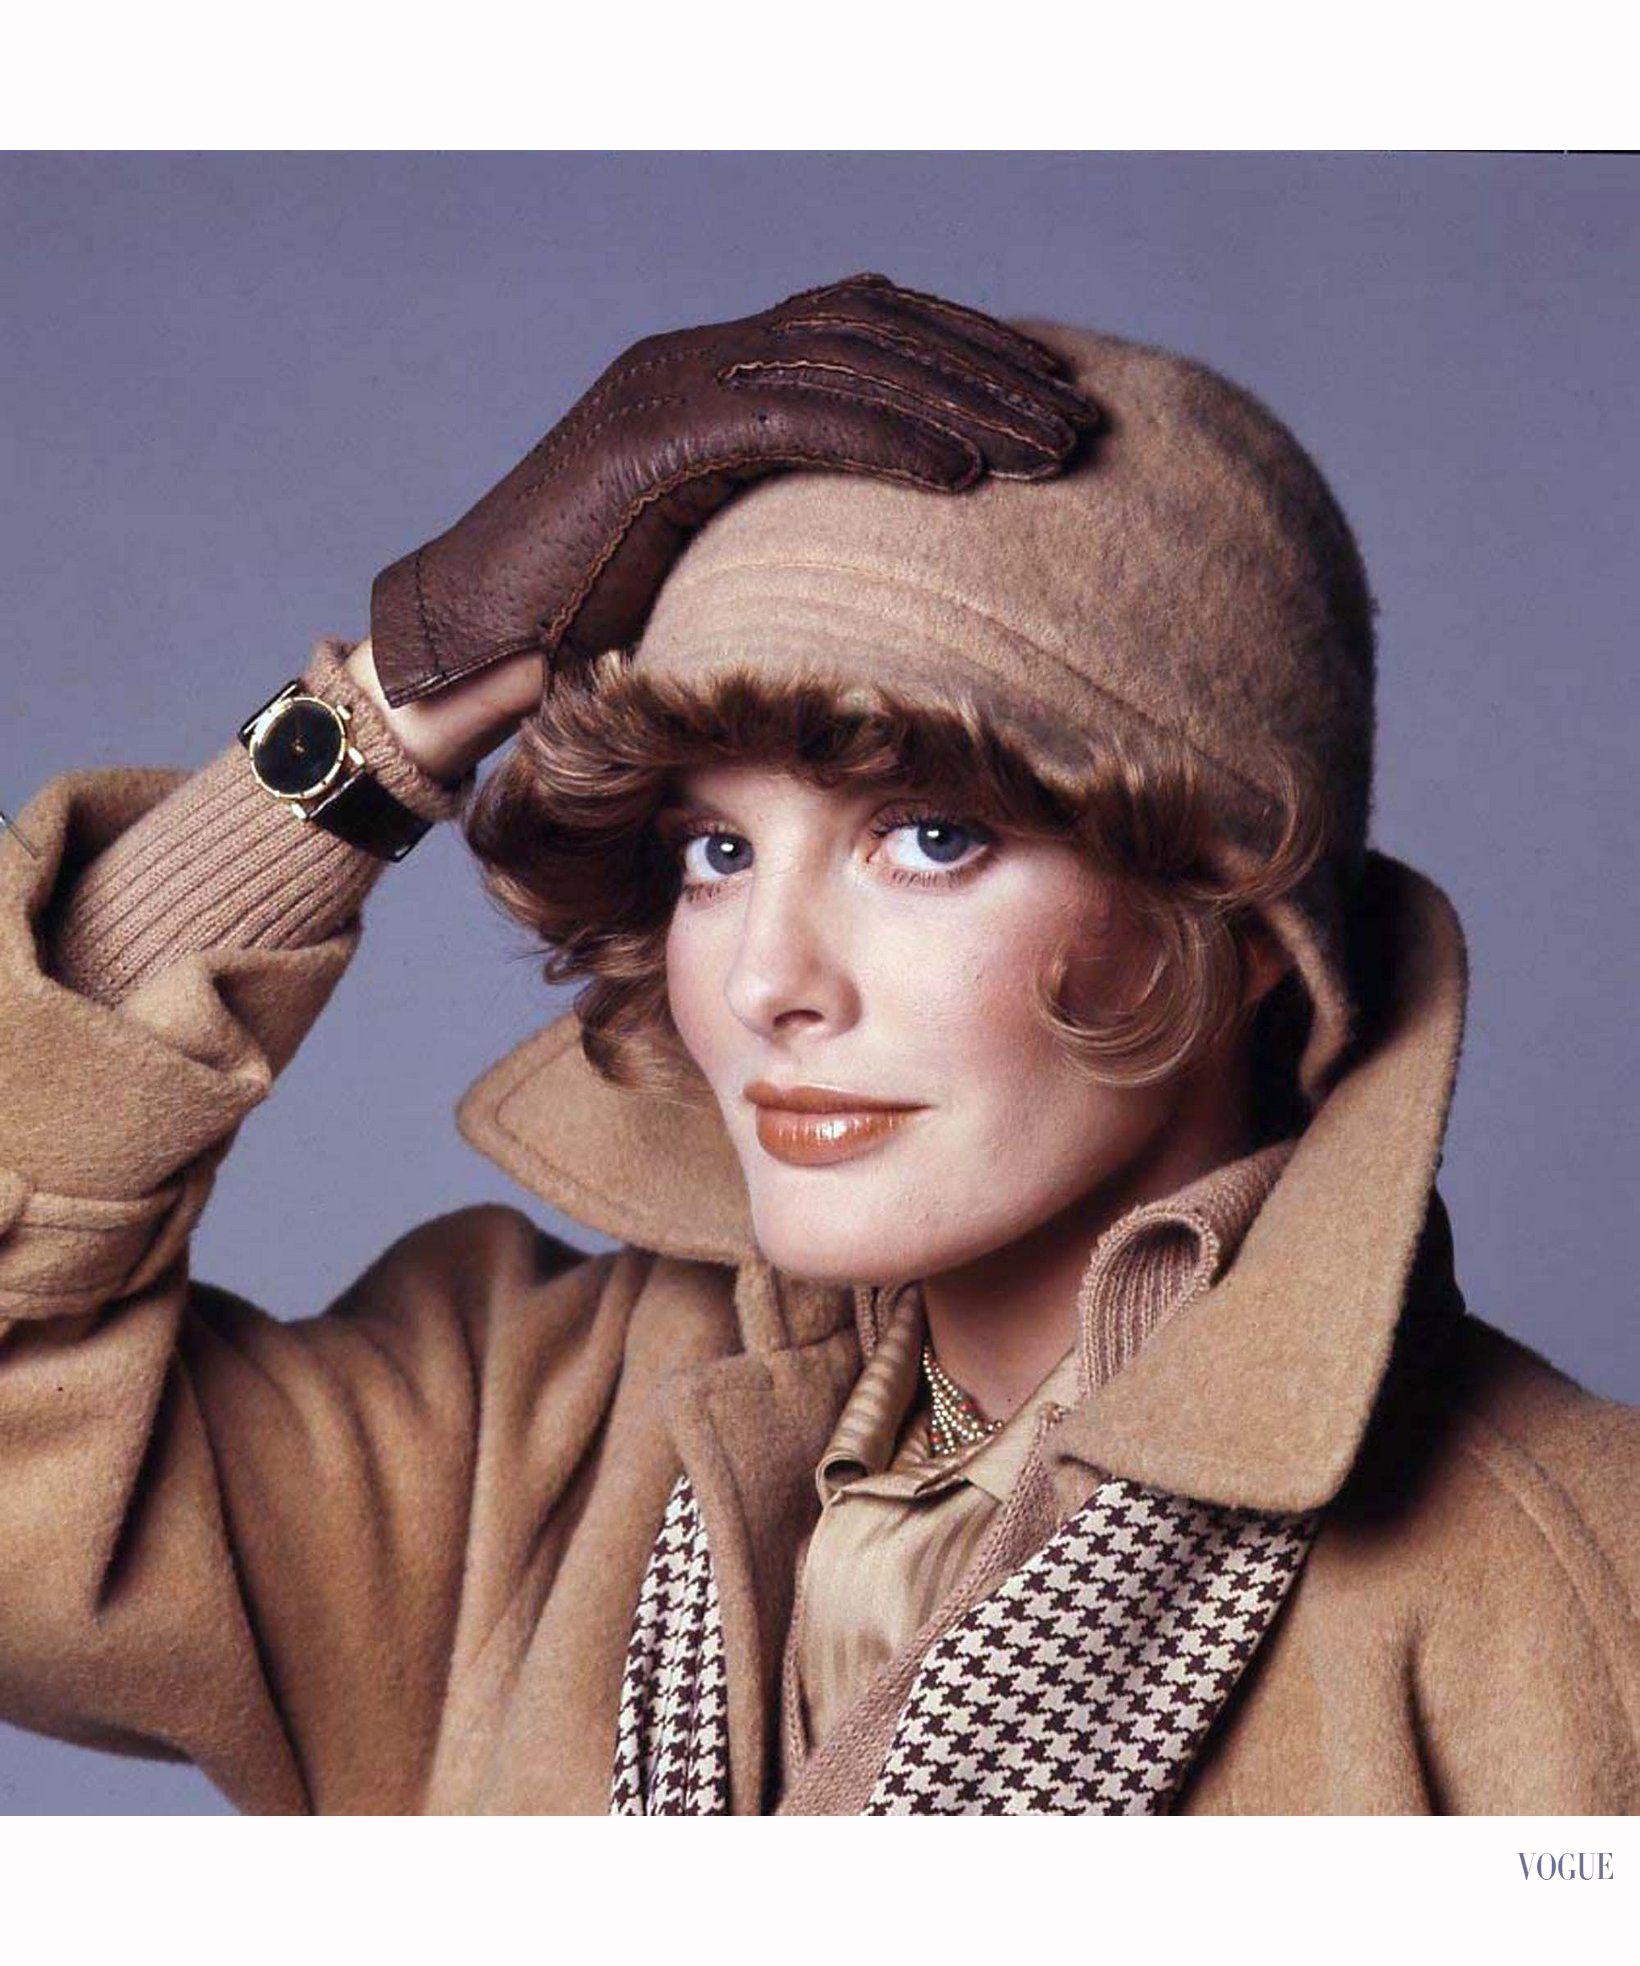 Rene Russo – Vogue 1974